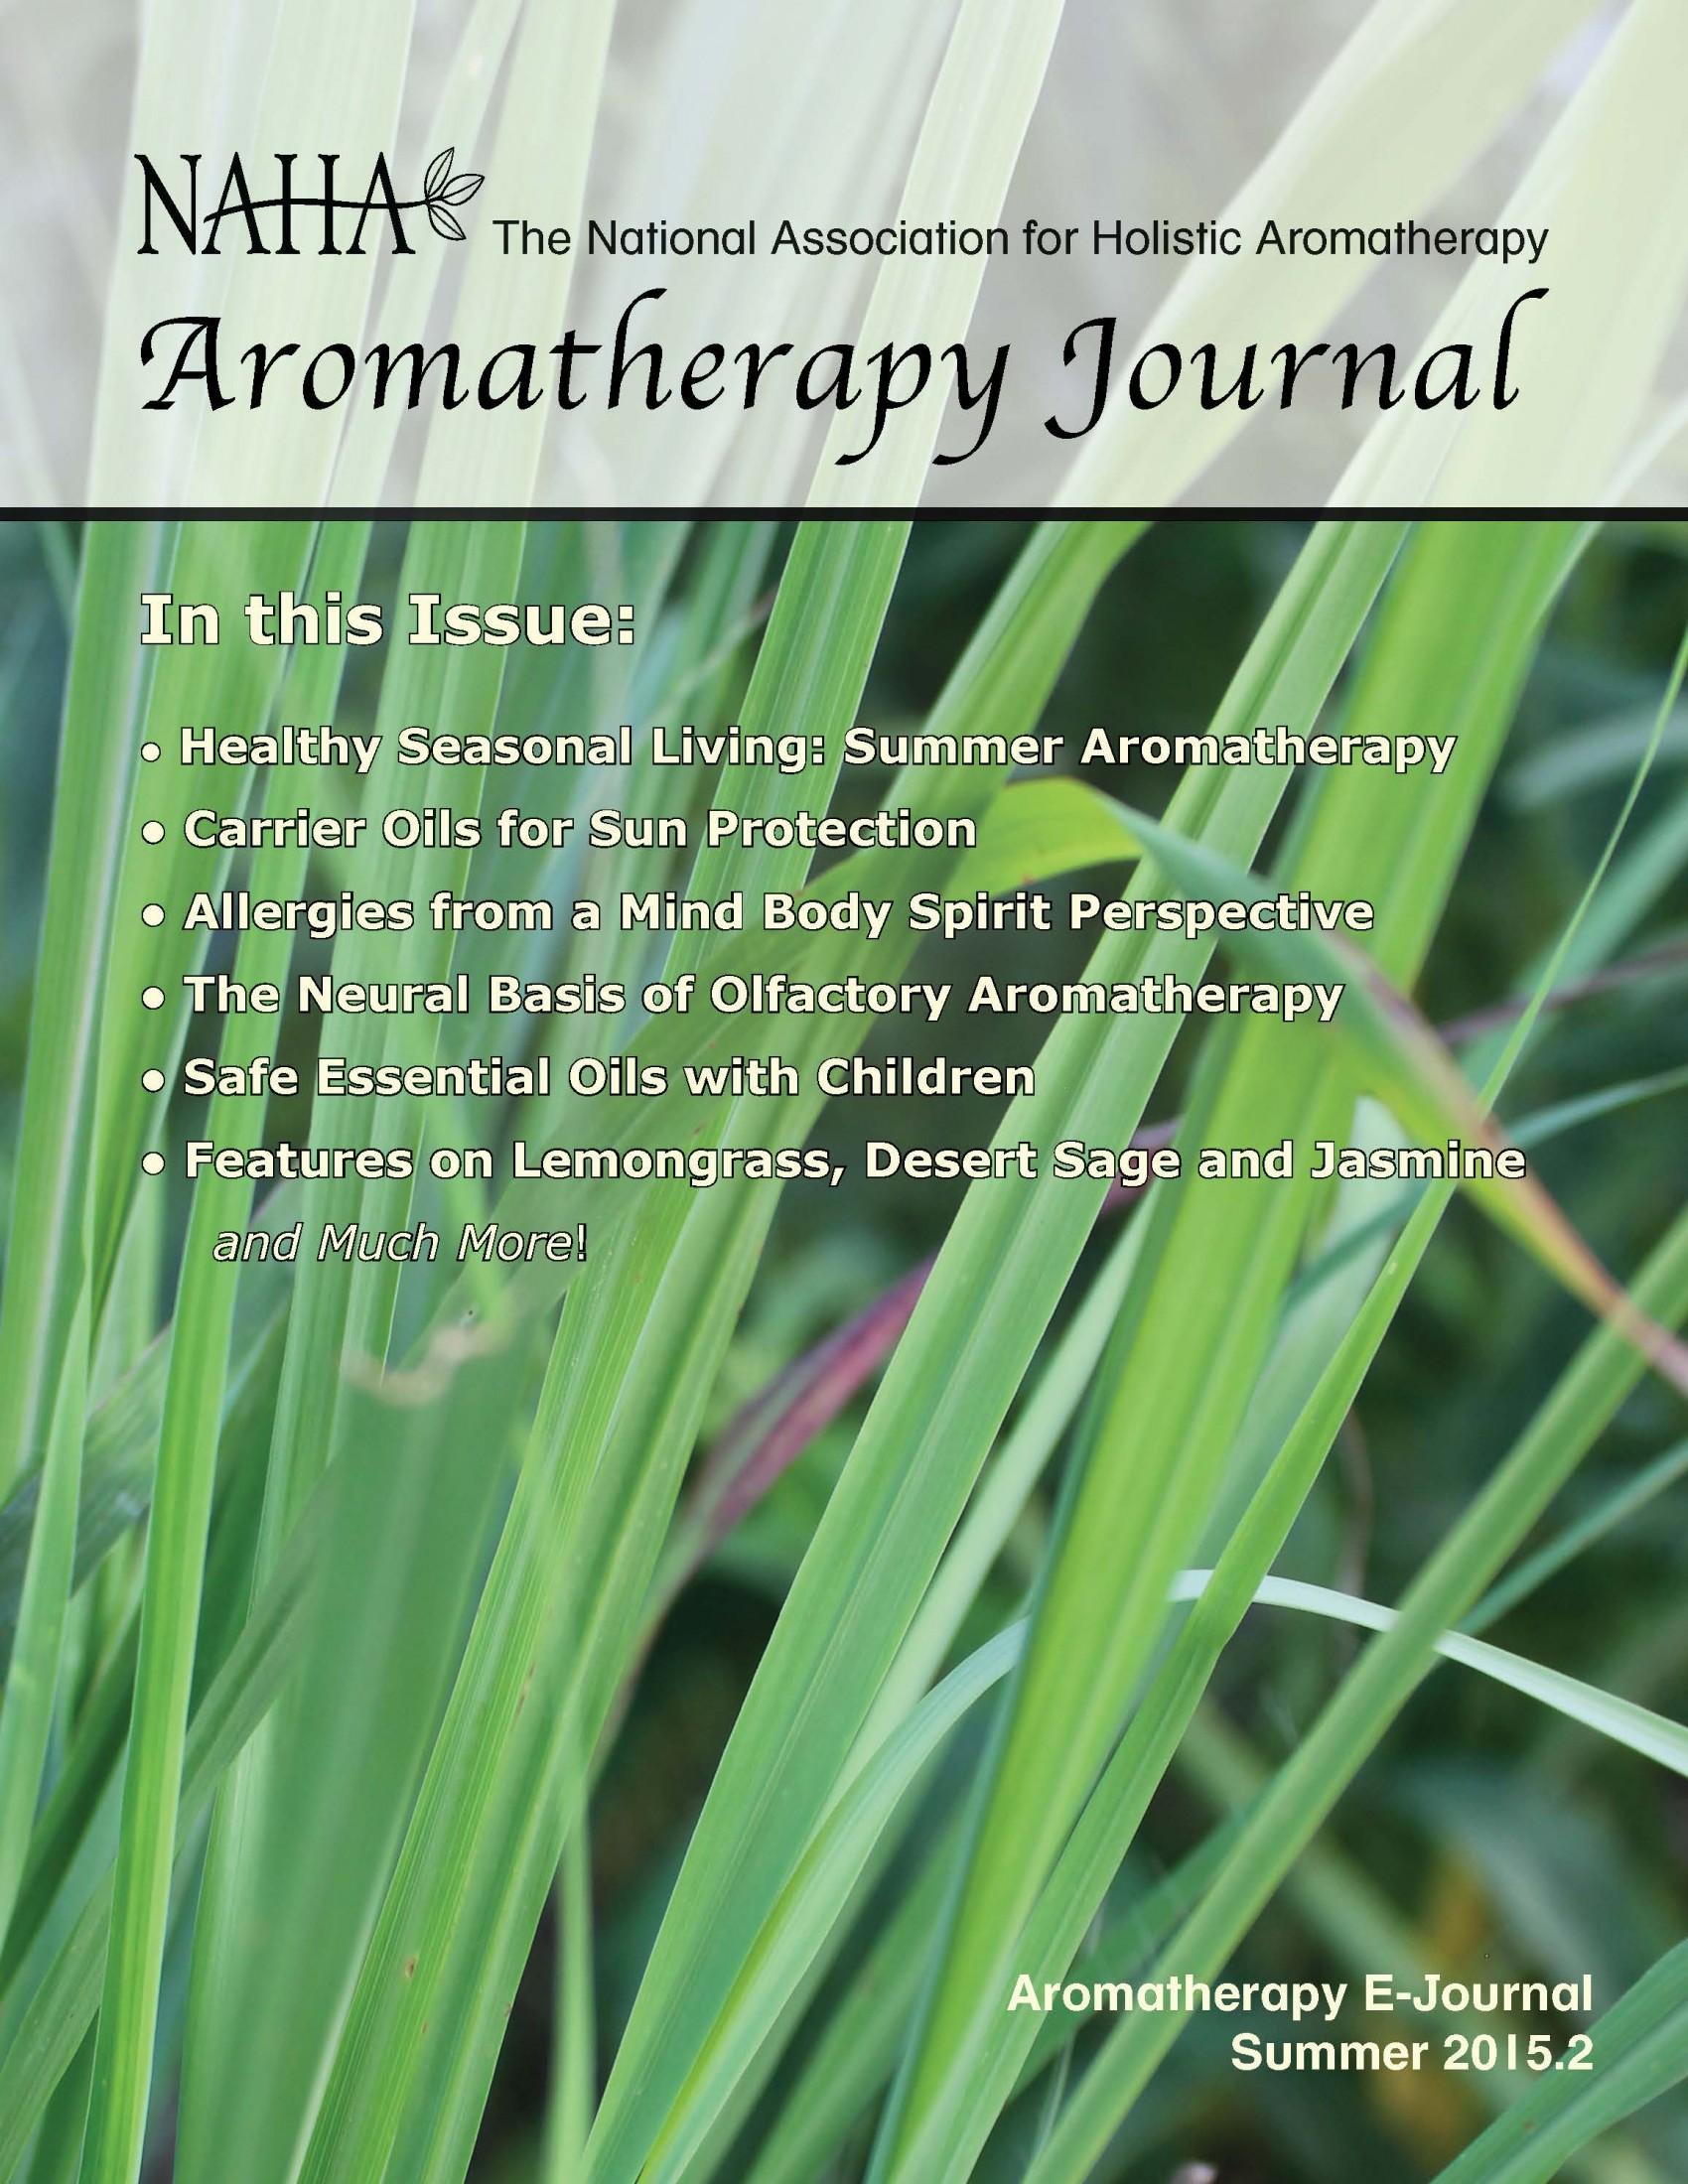 NAHA's Aromatherapy Journal Summer 2015.2